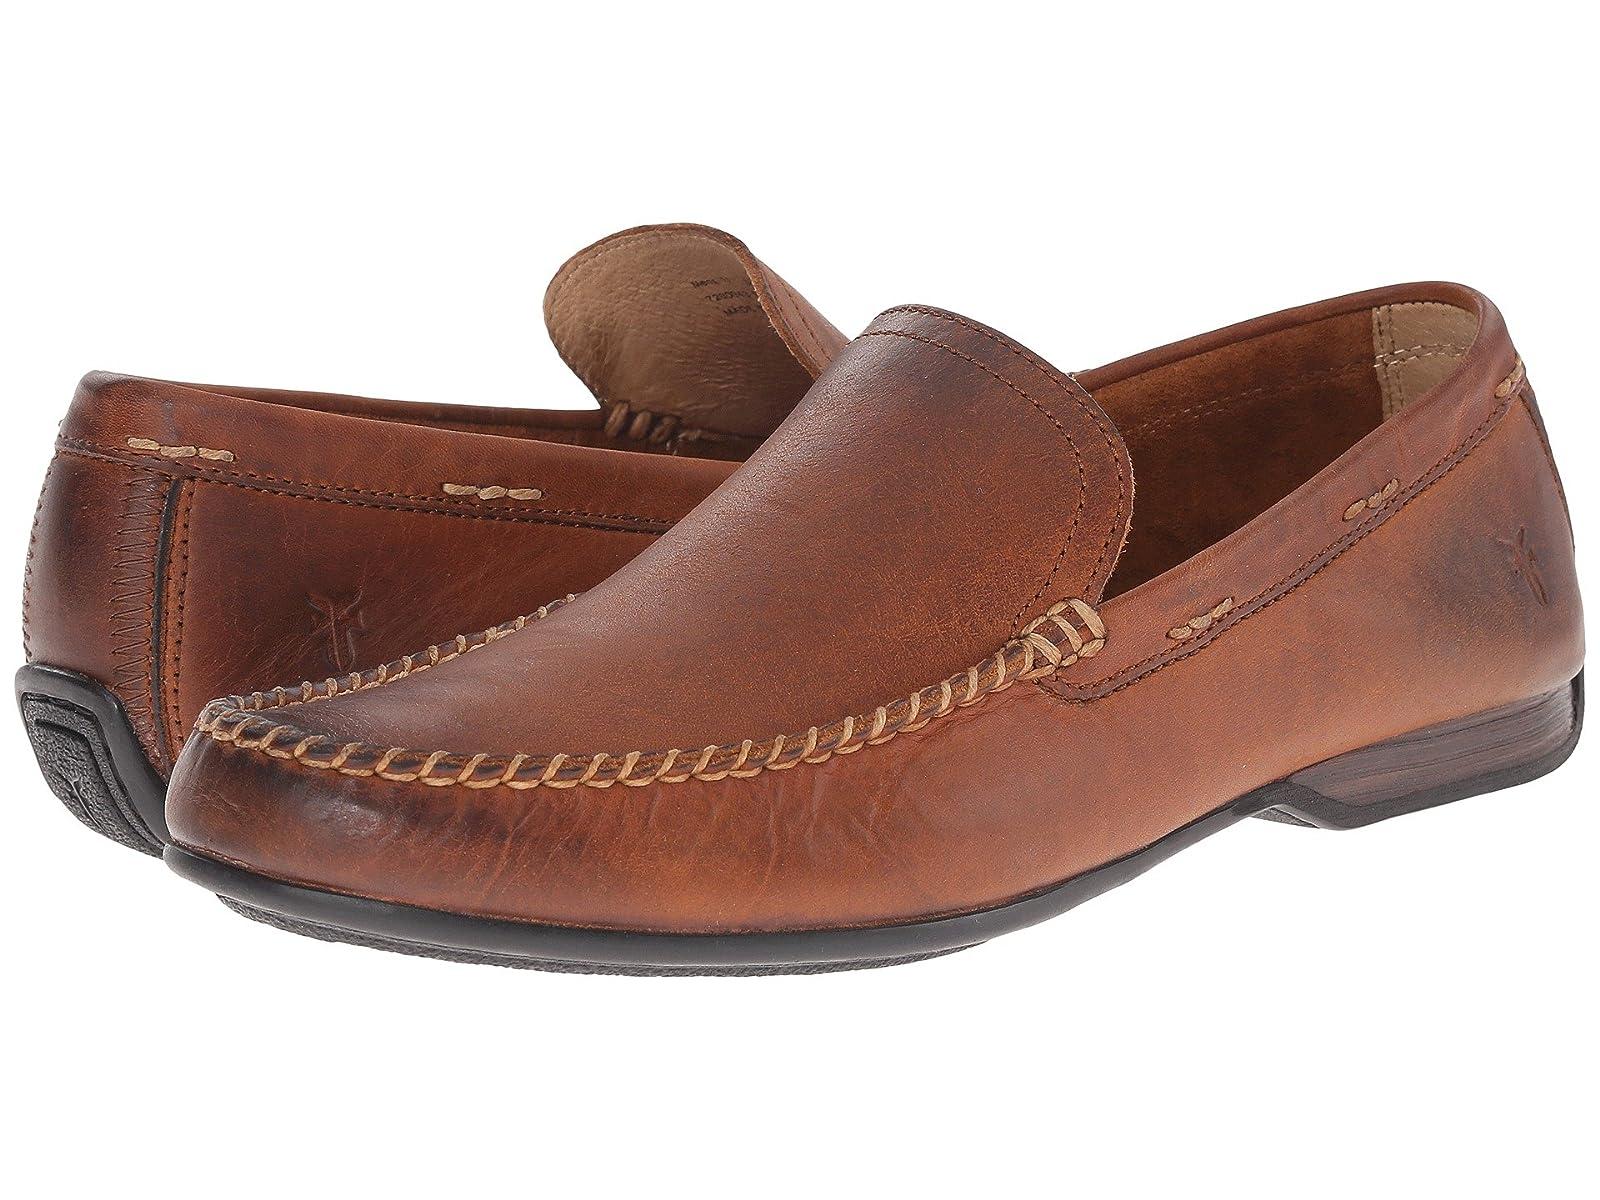 Frye Lewis VenetianAtmospheric grades have affordable shoes